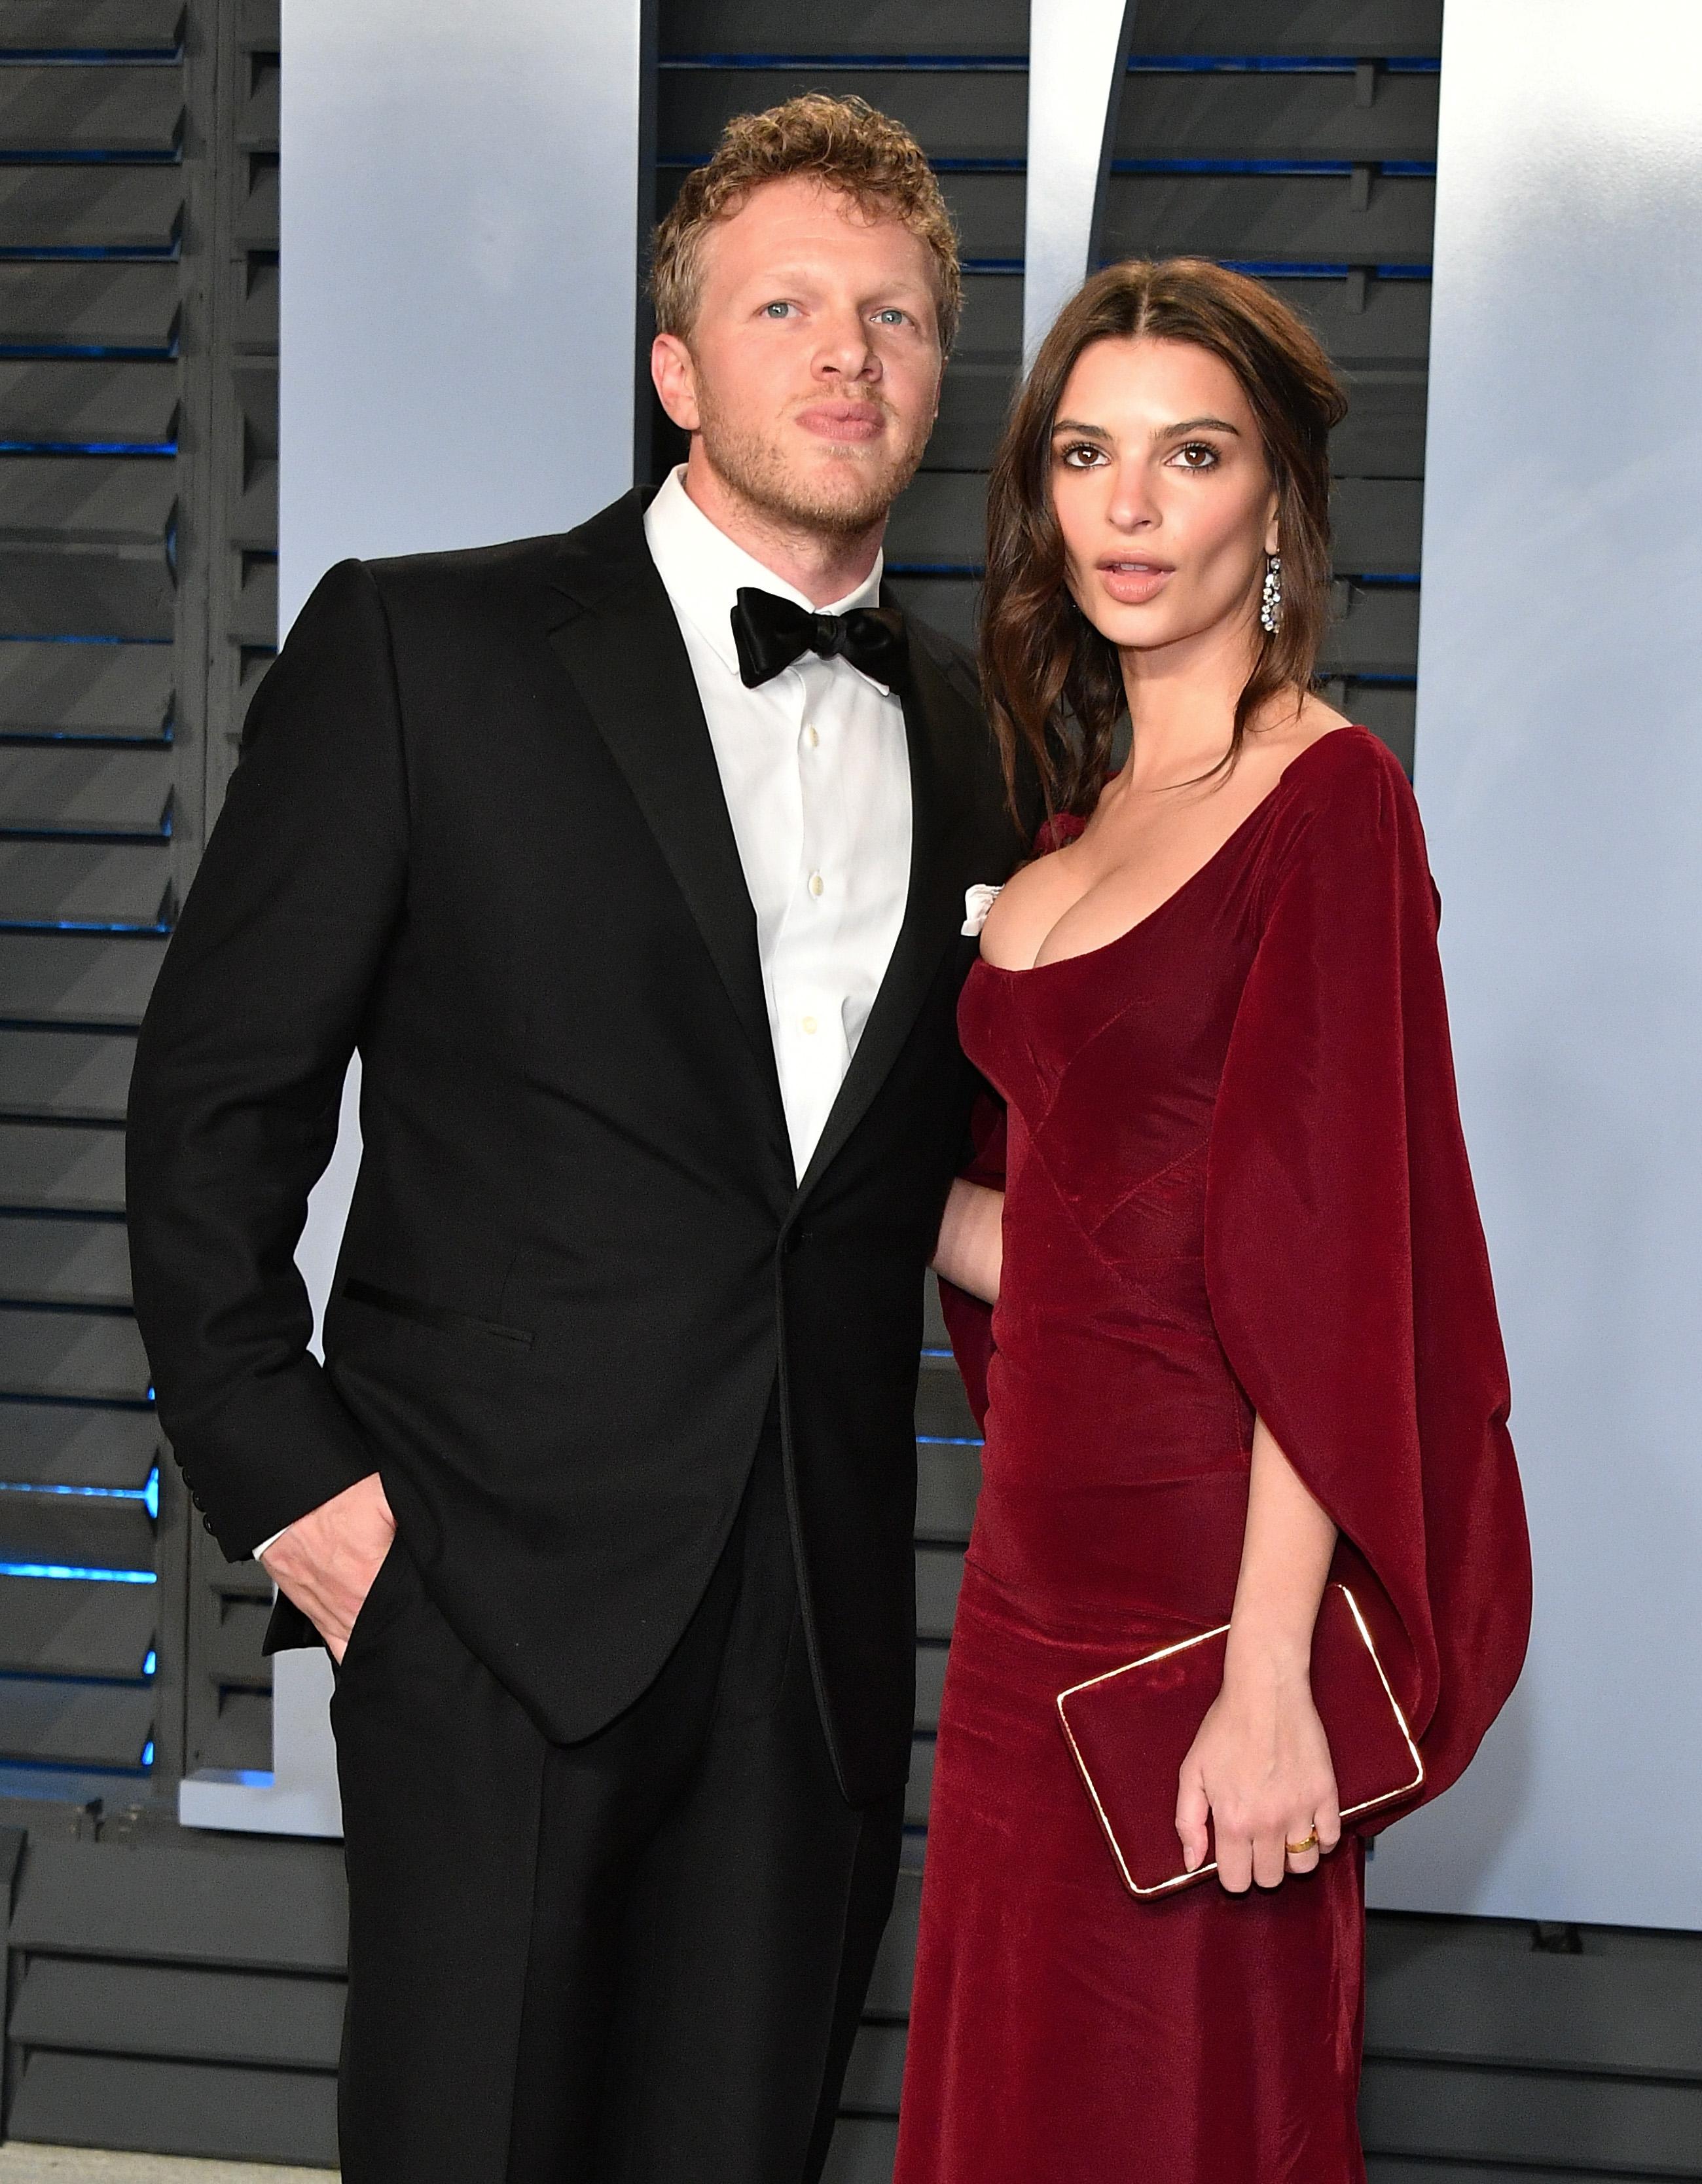 Emily Ratajkowski and Sebastian Bear-McClard (Source: Getty Images)